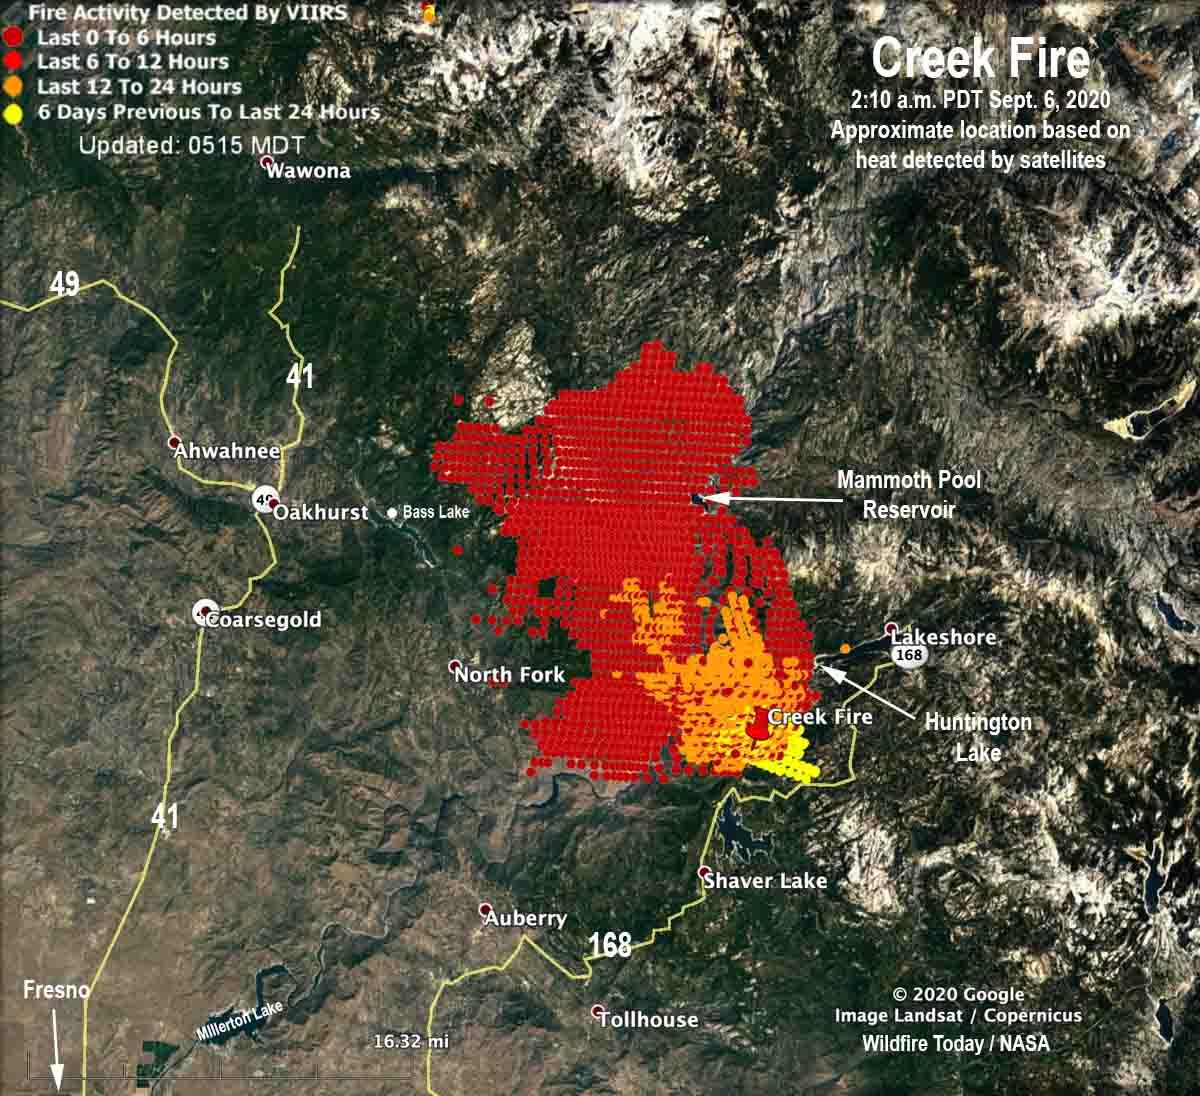 map of Creek Fire California